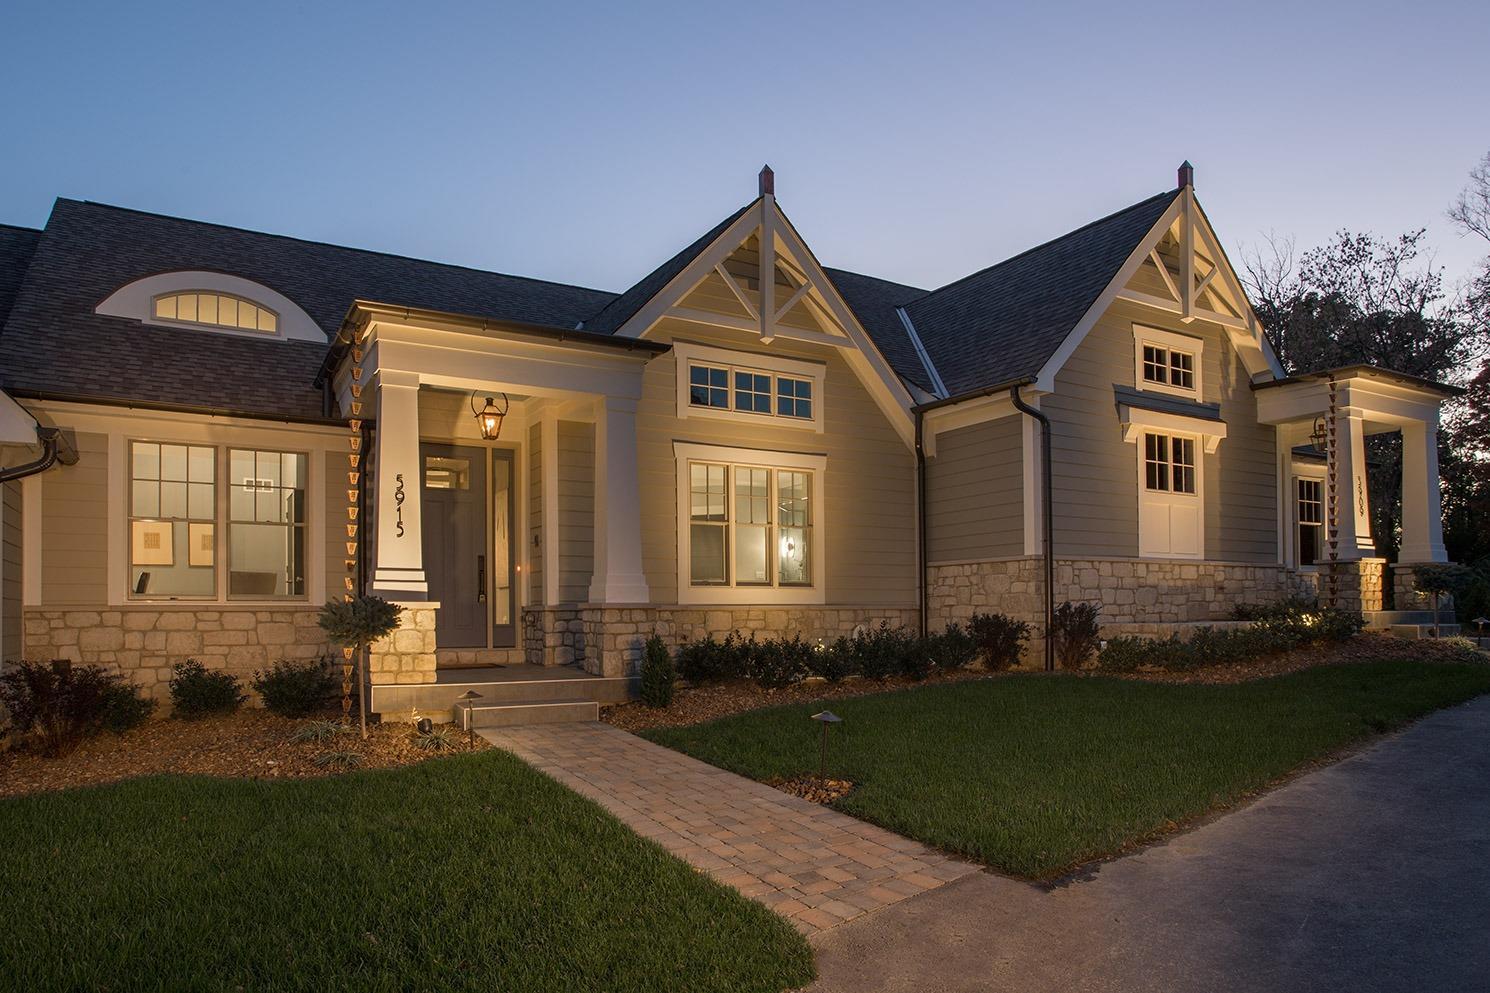 Property for sale at 5957 Woodland Lane, Columbia Twp,  Ohio 45227